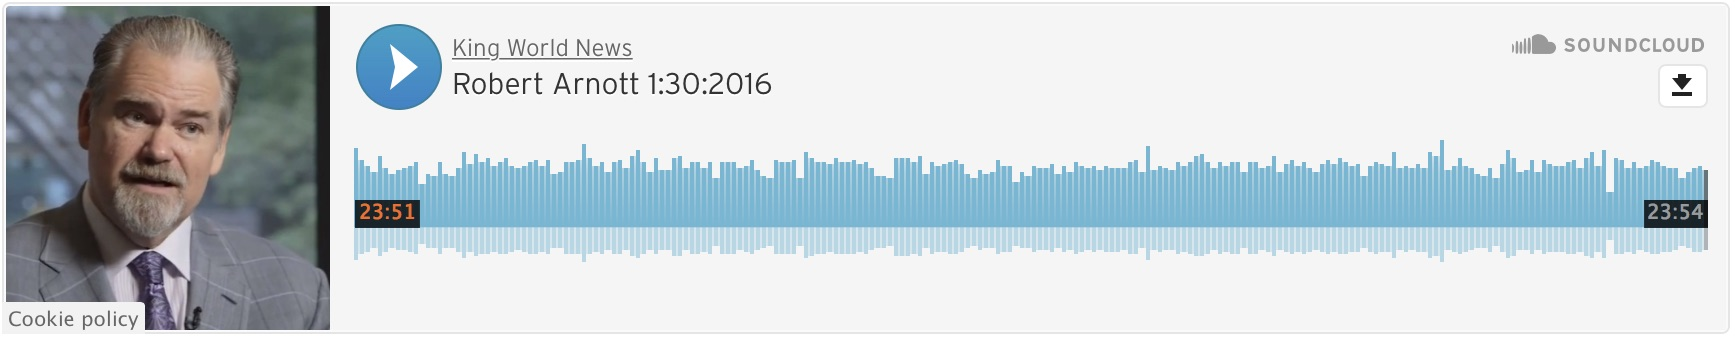 KWN ARNOTT MP3 1:30:2016